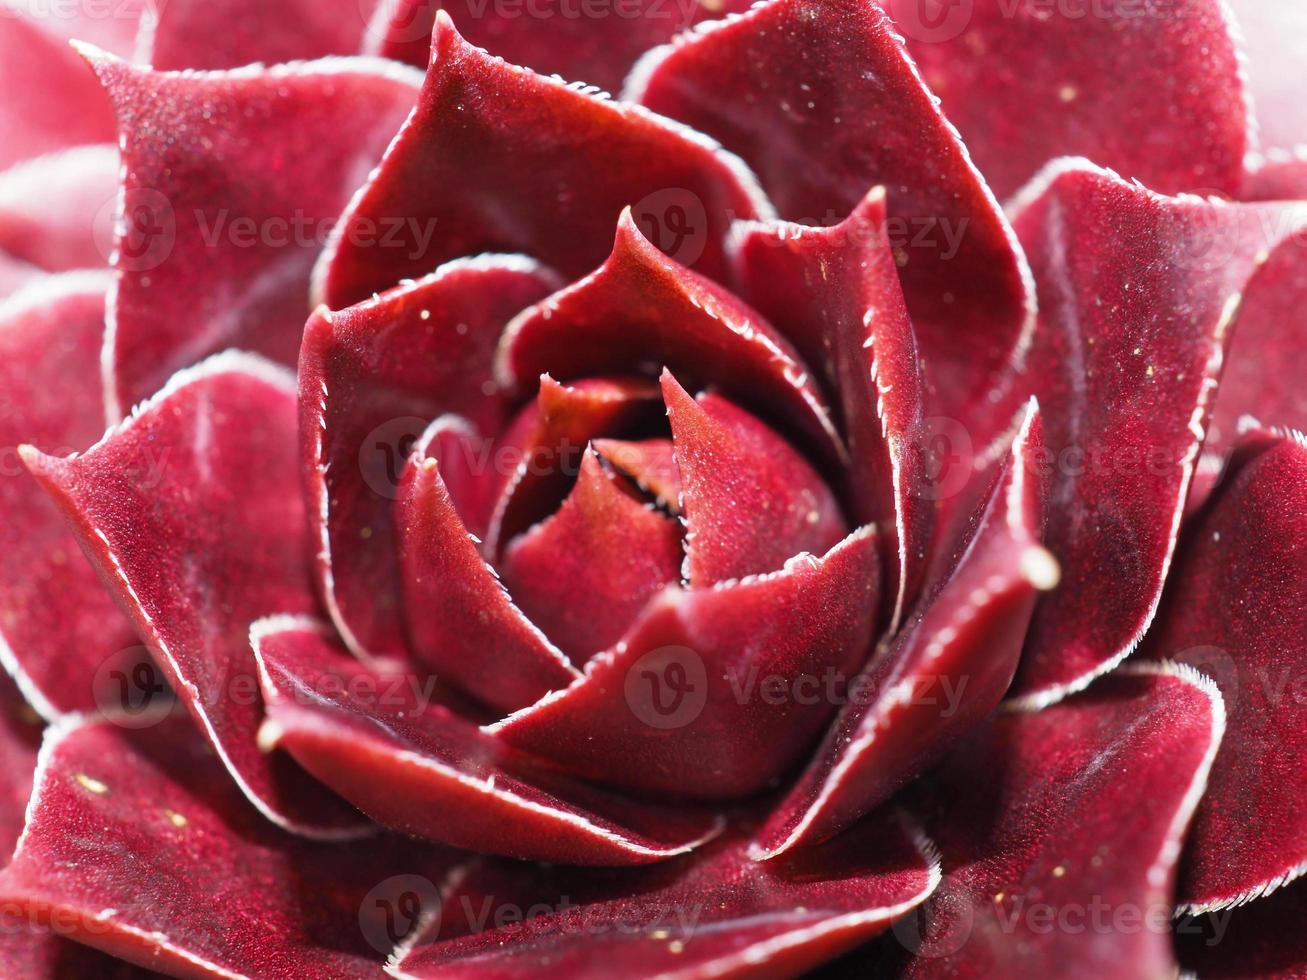 planta suculenta roja foto